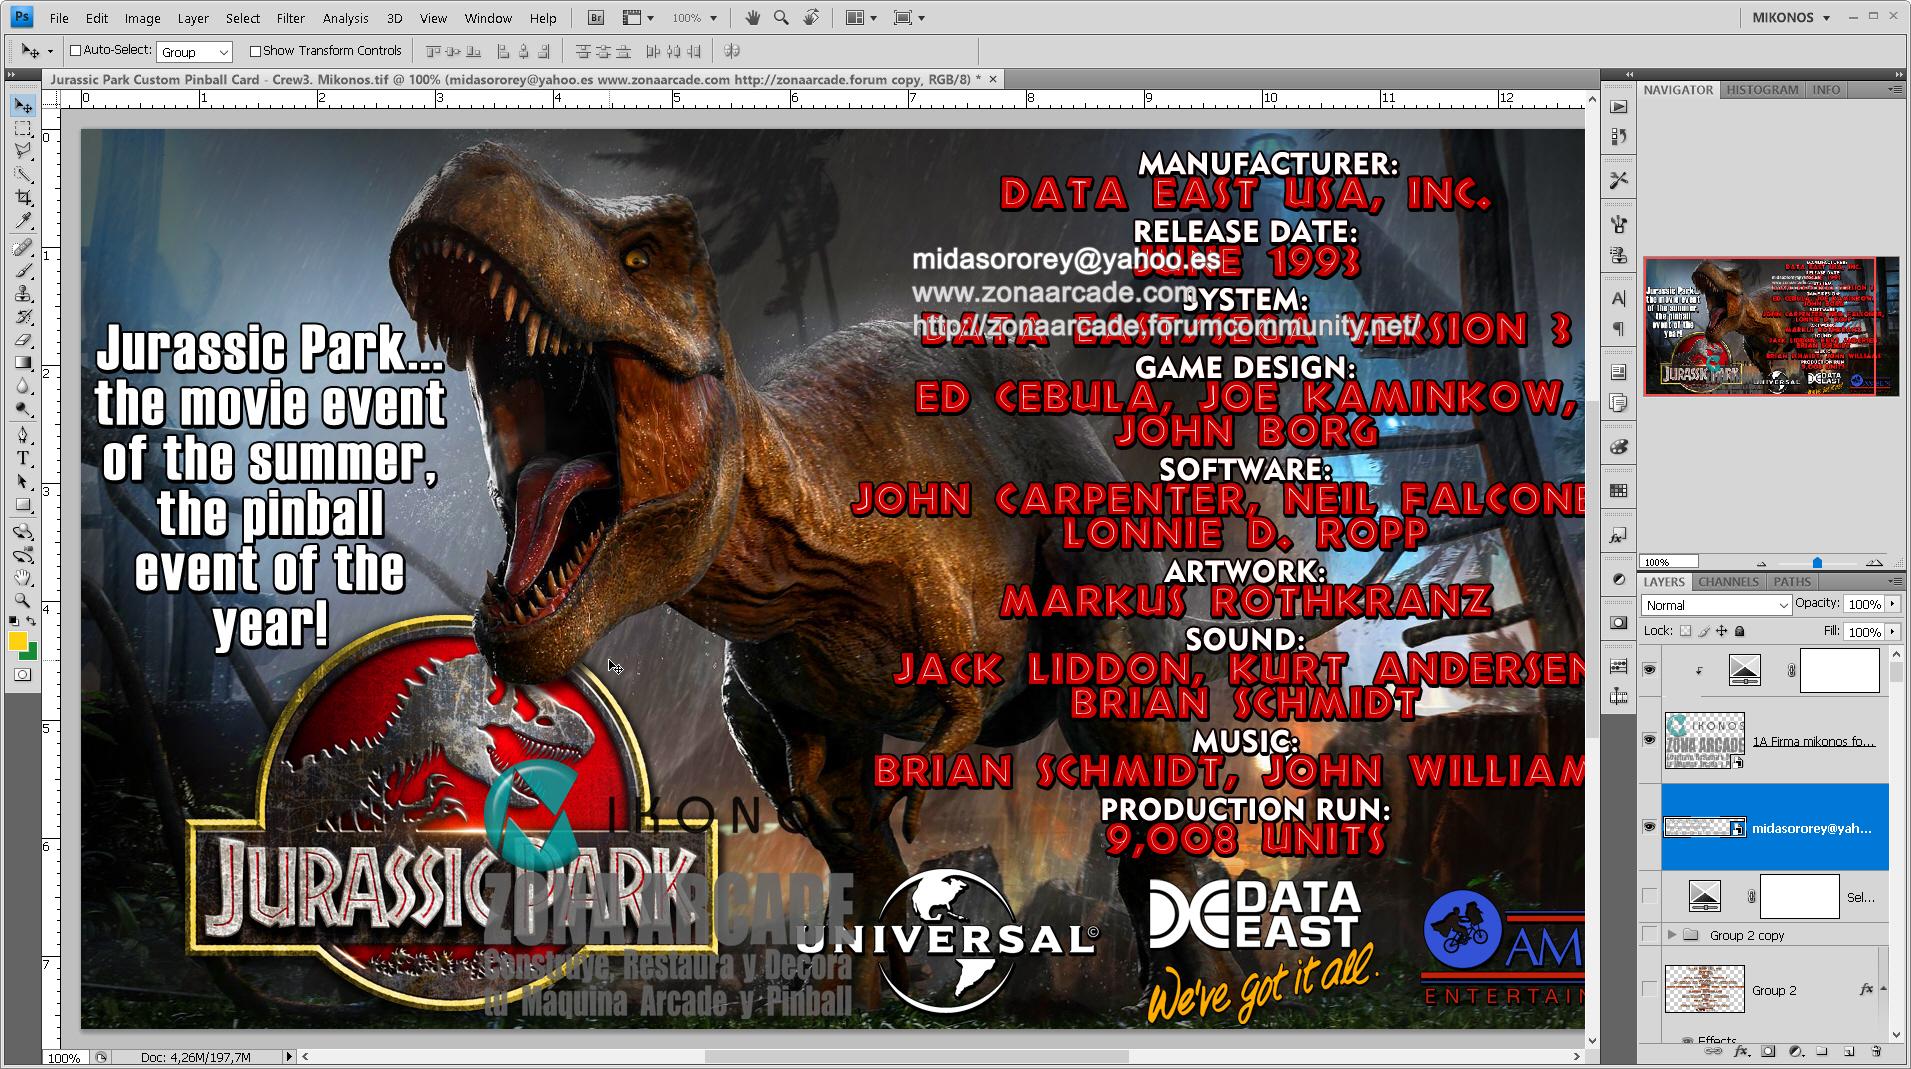 Jurassic-Park-Custom-Pinball-Card-Crew2-Mikonos2.jpg